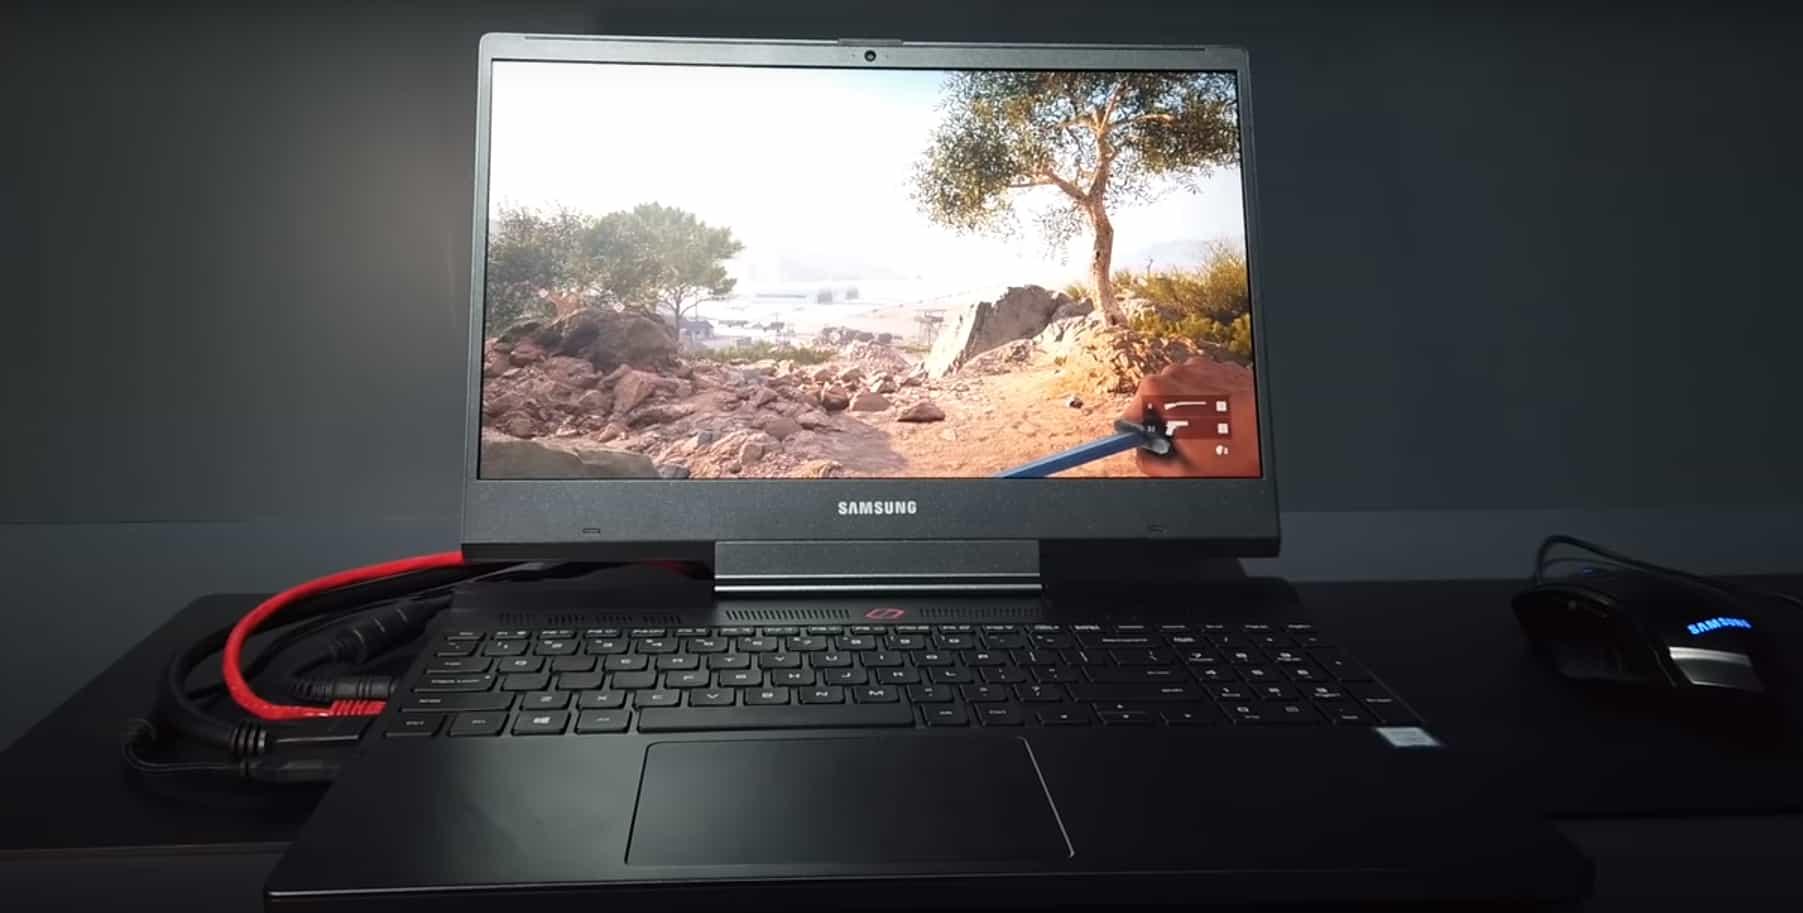 Samsung Notebook Odyssey, Samsung, Samsung Odyssey laptop